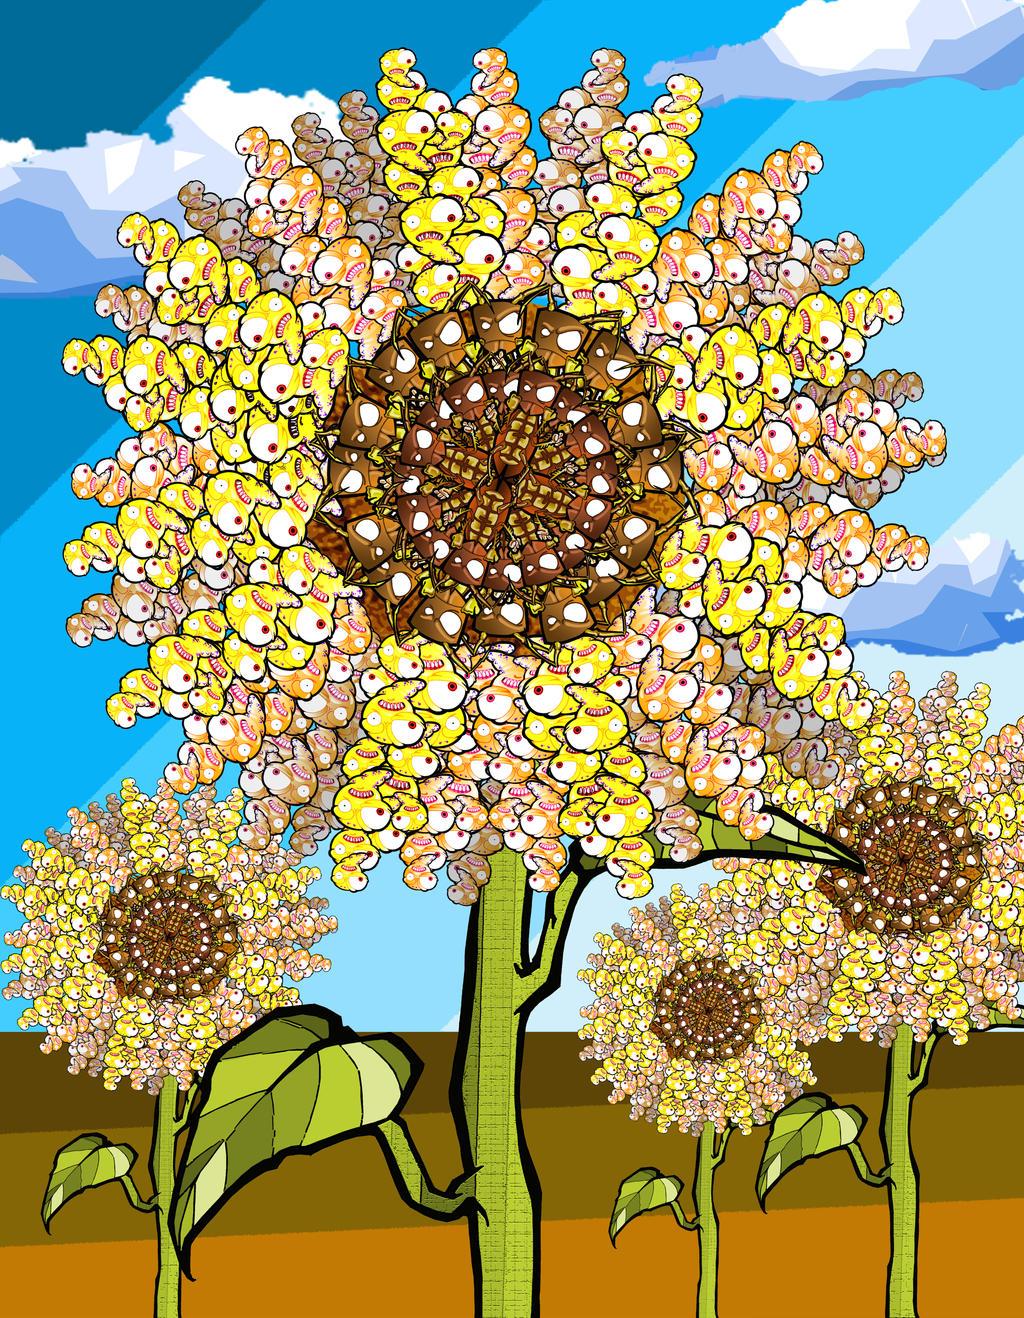 Van gogh sun flower ( insects everywhere) by BrainBlueArts